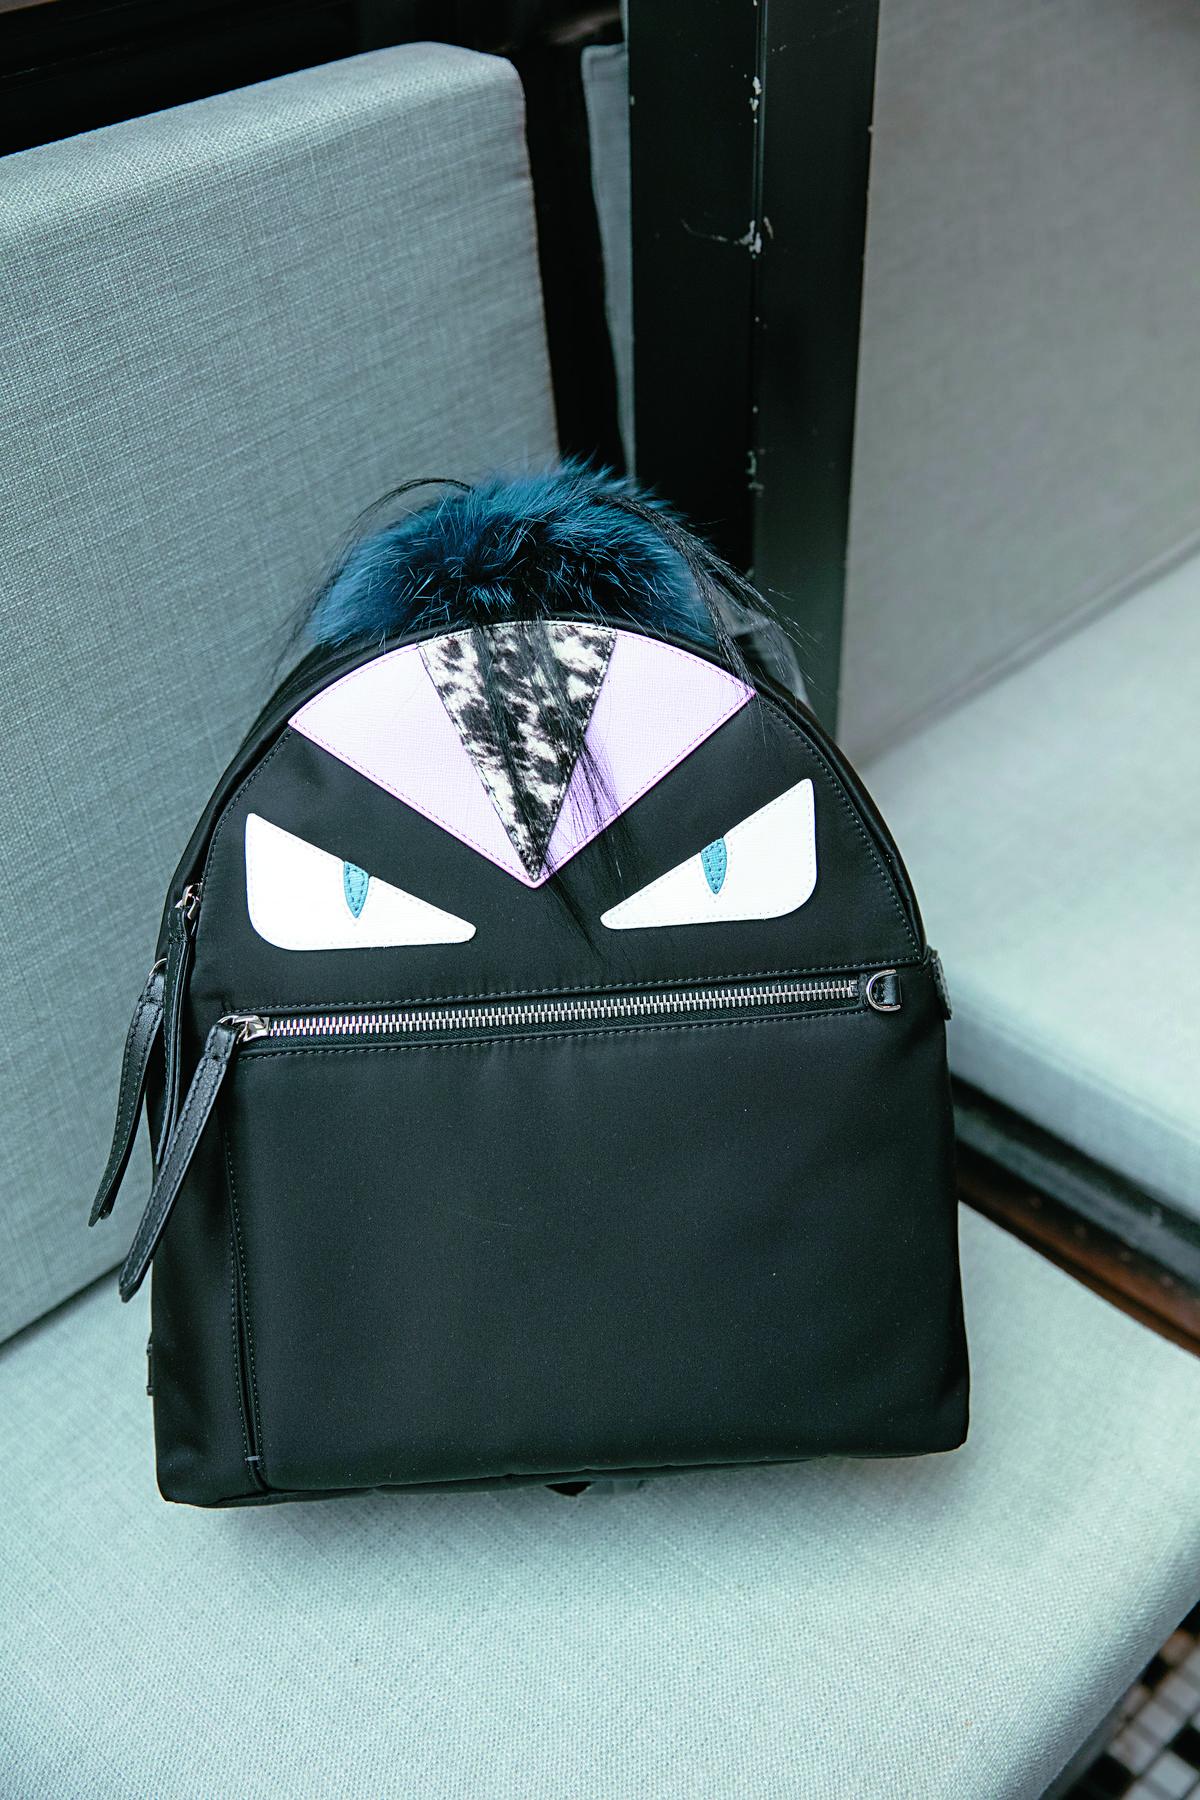 FENDI魔魔後背包-約NT$80,000(背在背上可以讓雙手空出來,才能抱寶寶。)